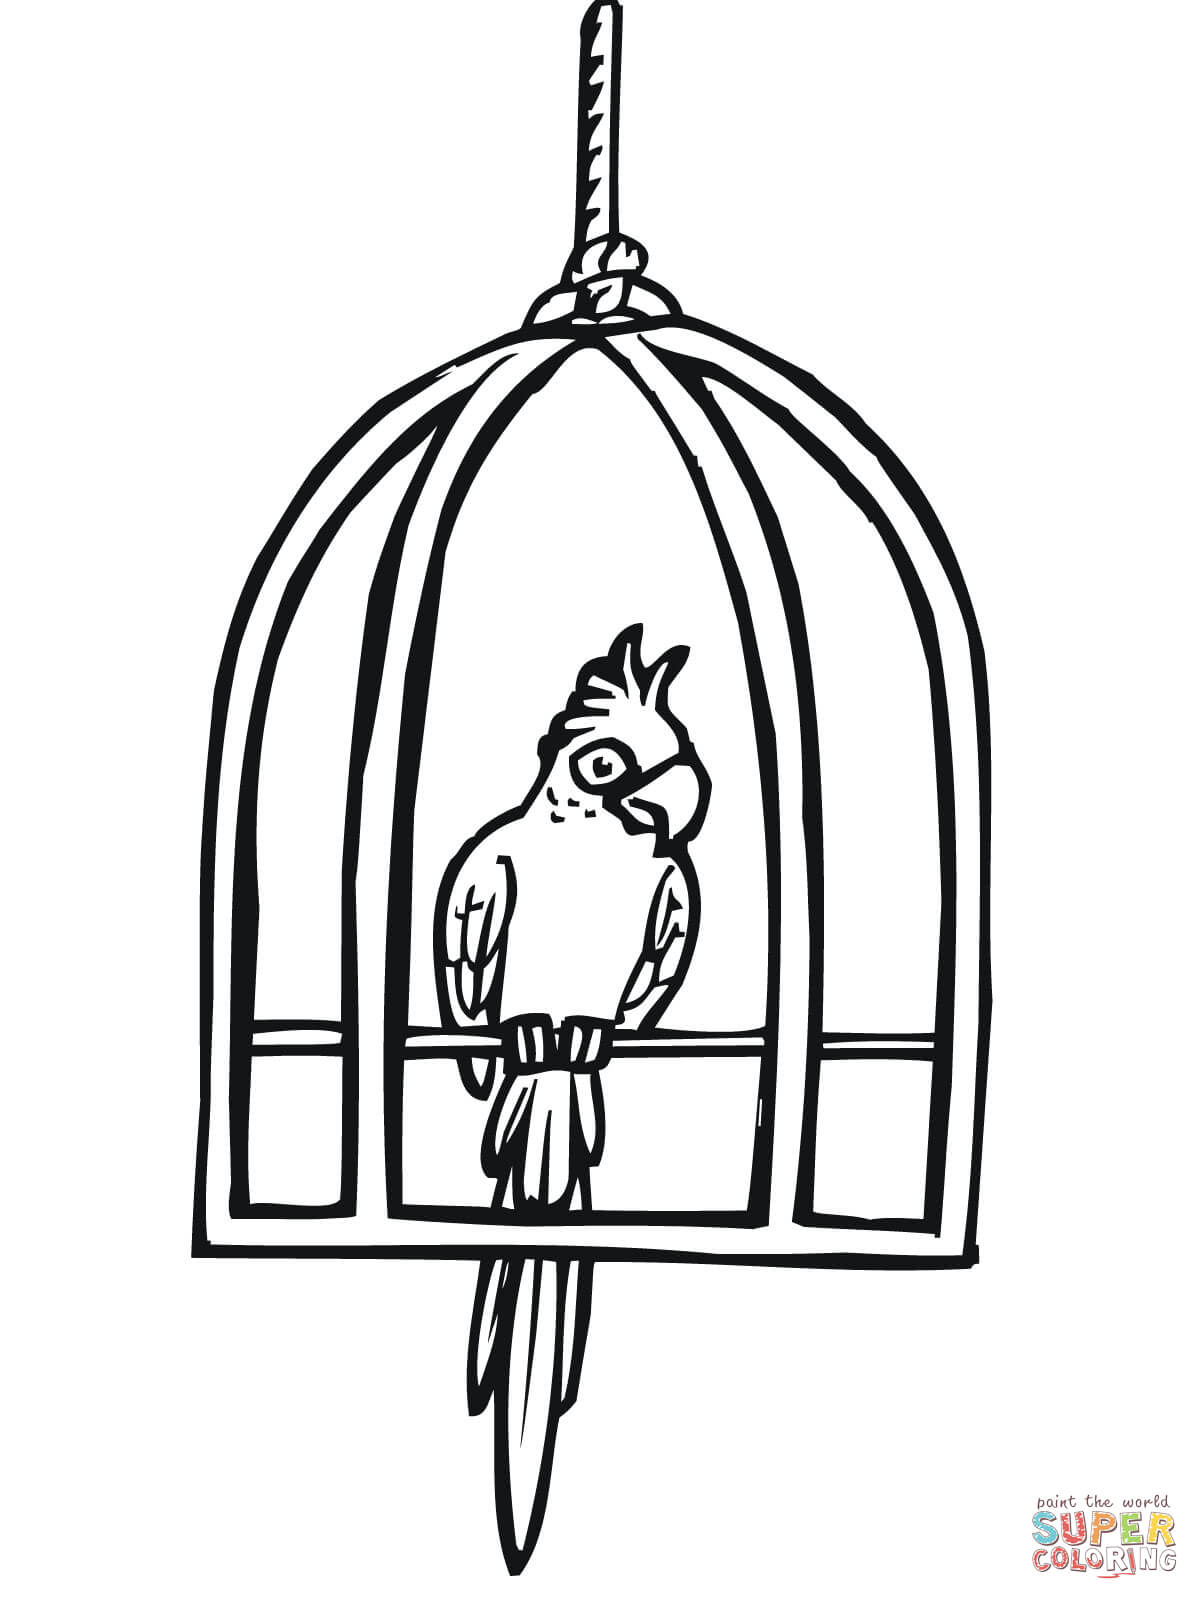 Parrot Pencil Drawing At Getdrawings